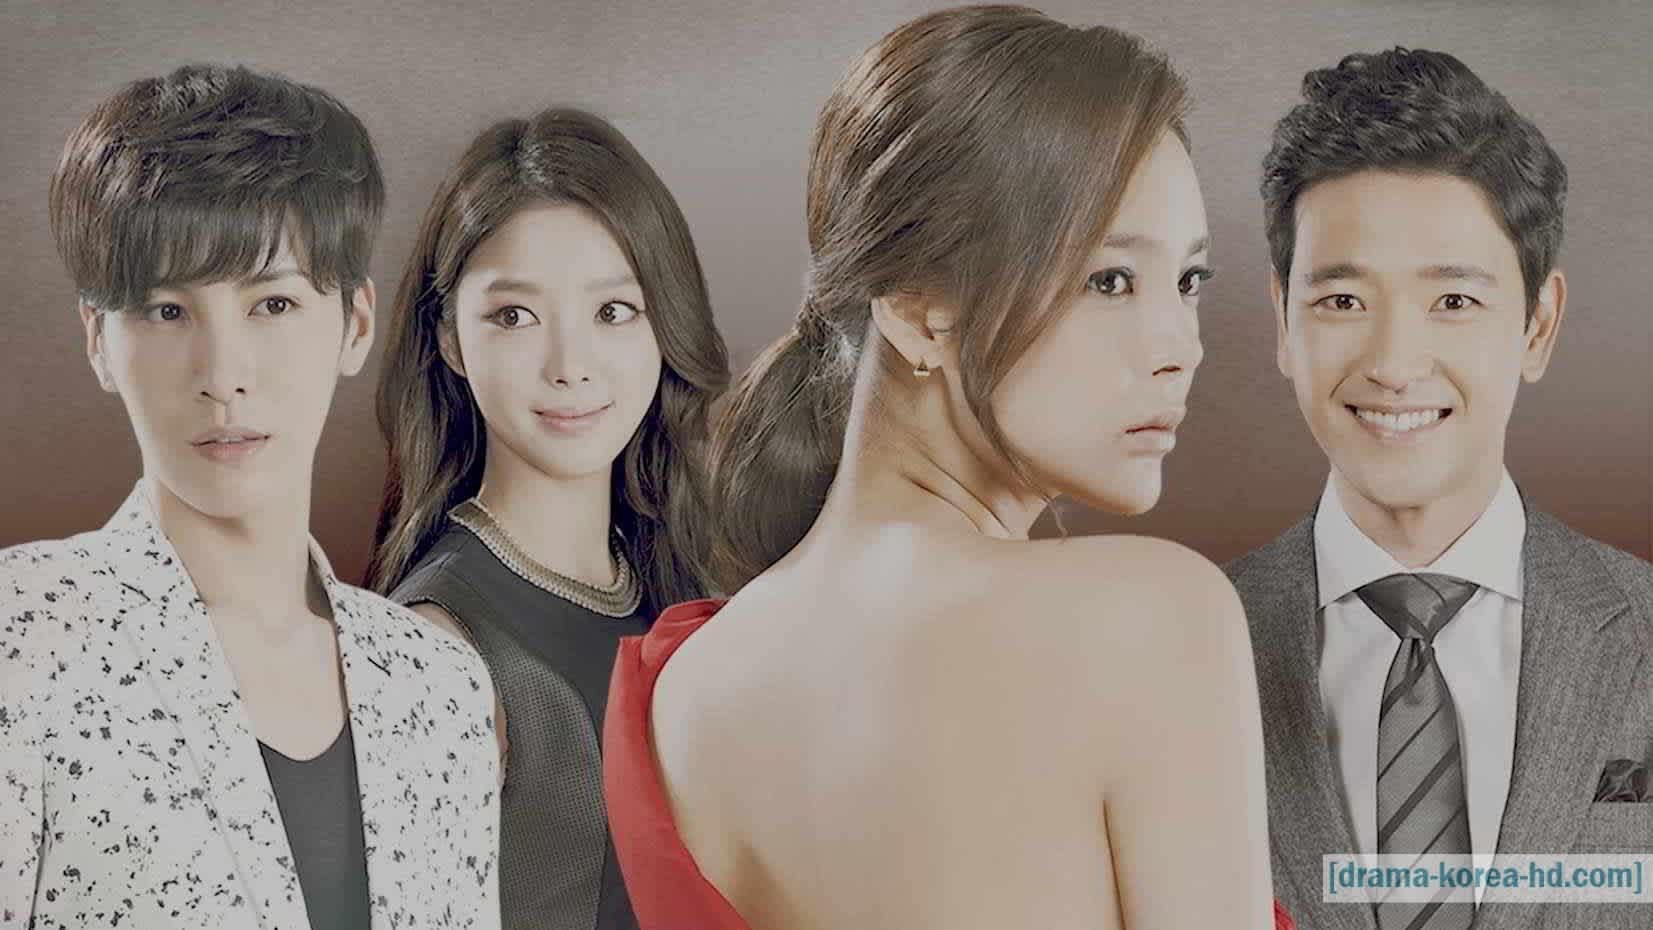 Greatest Marriage - Full Episode drama korea